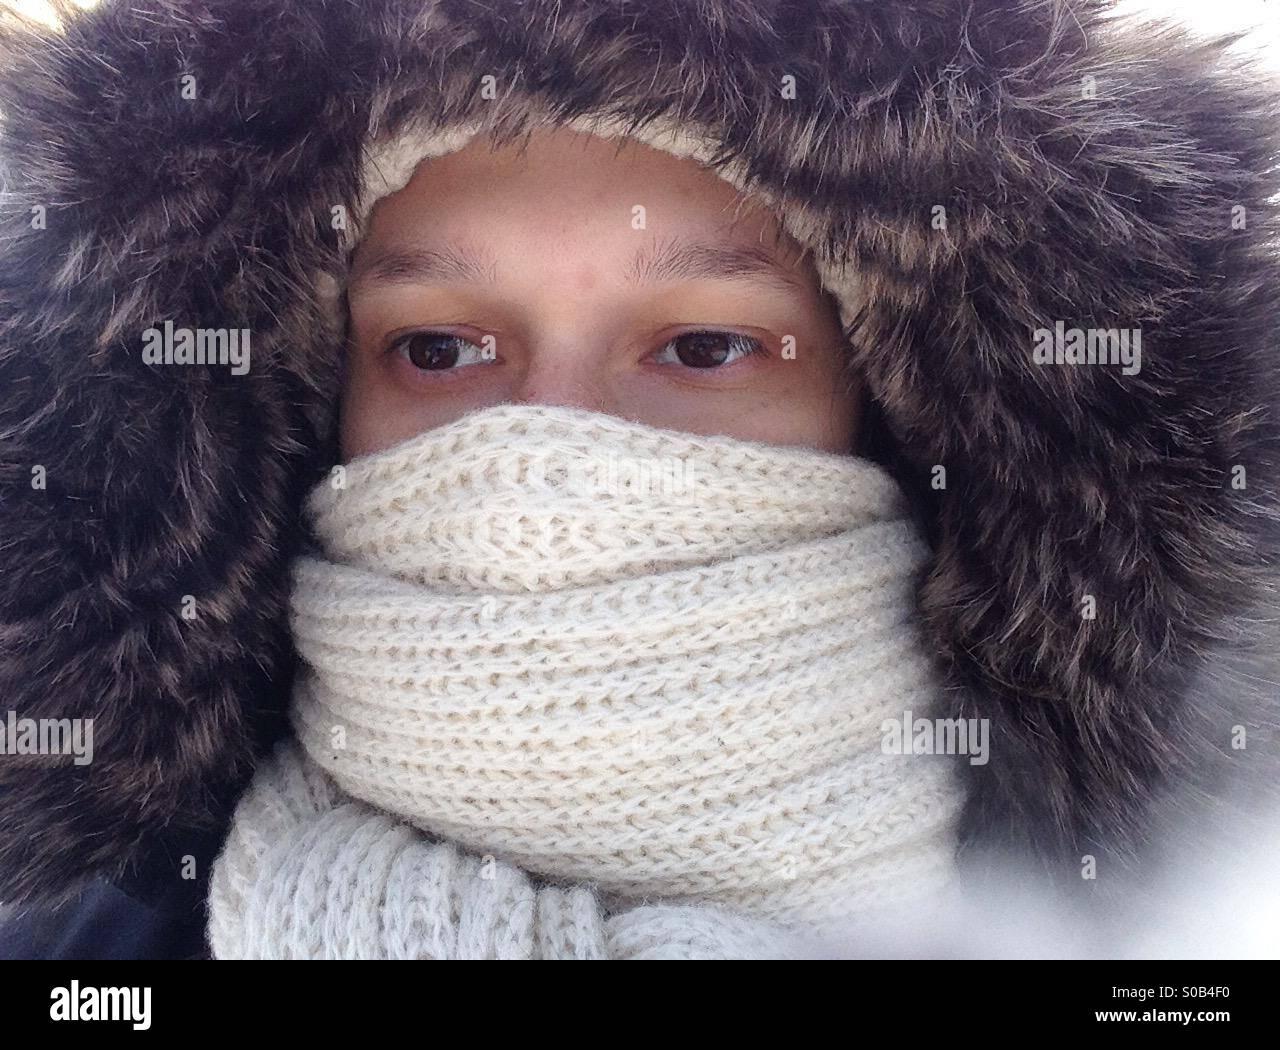 Winter portrait close up - Stock Image